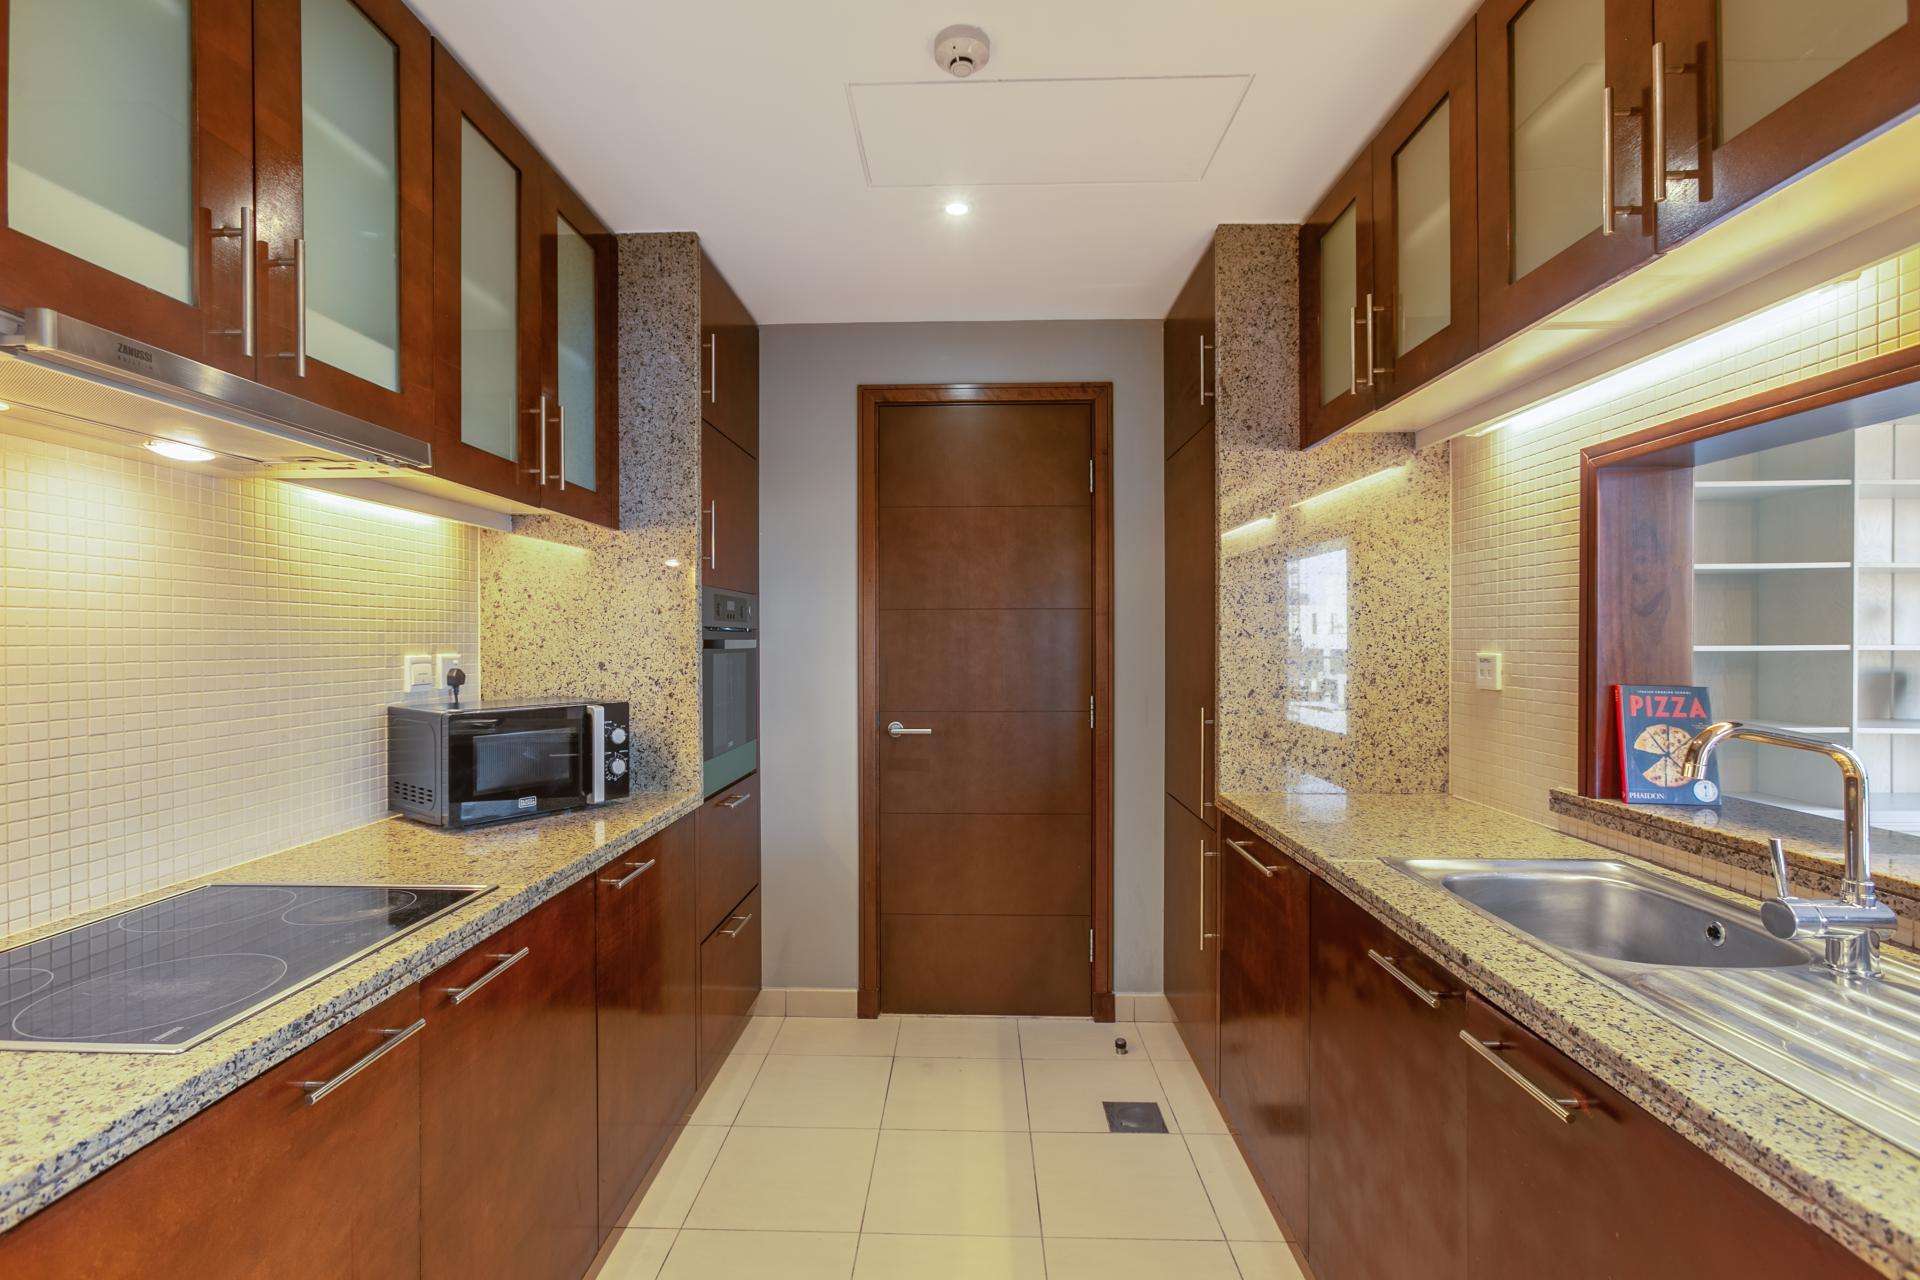 Kitchen at South Ridge Apartment, Financial District, Dubai